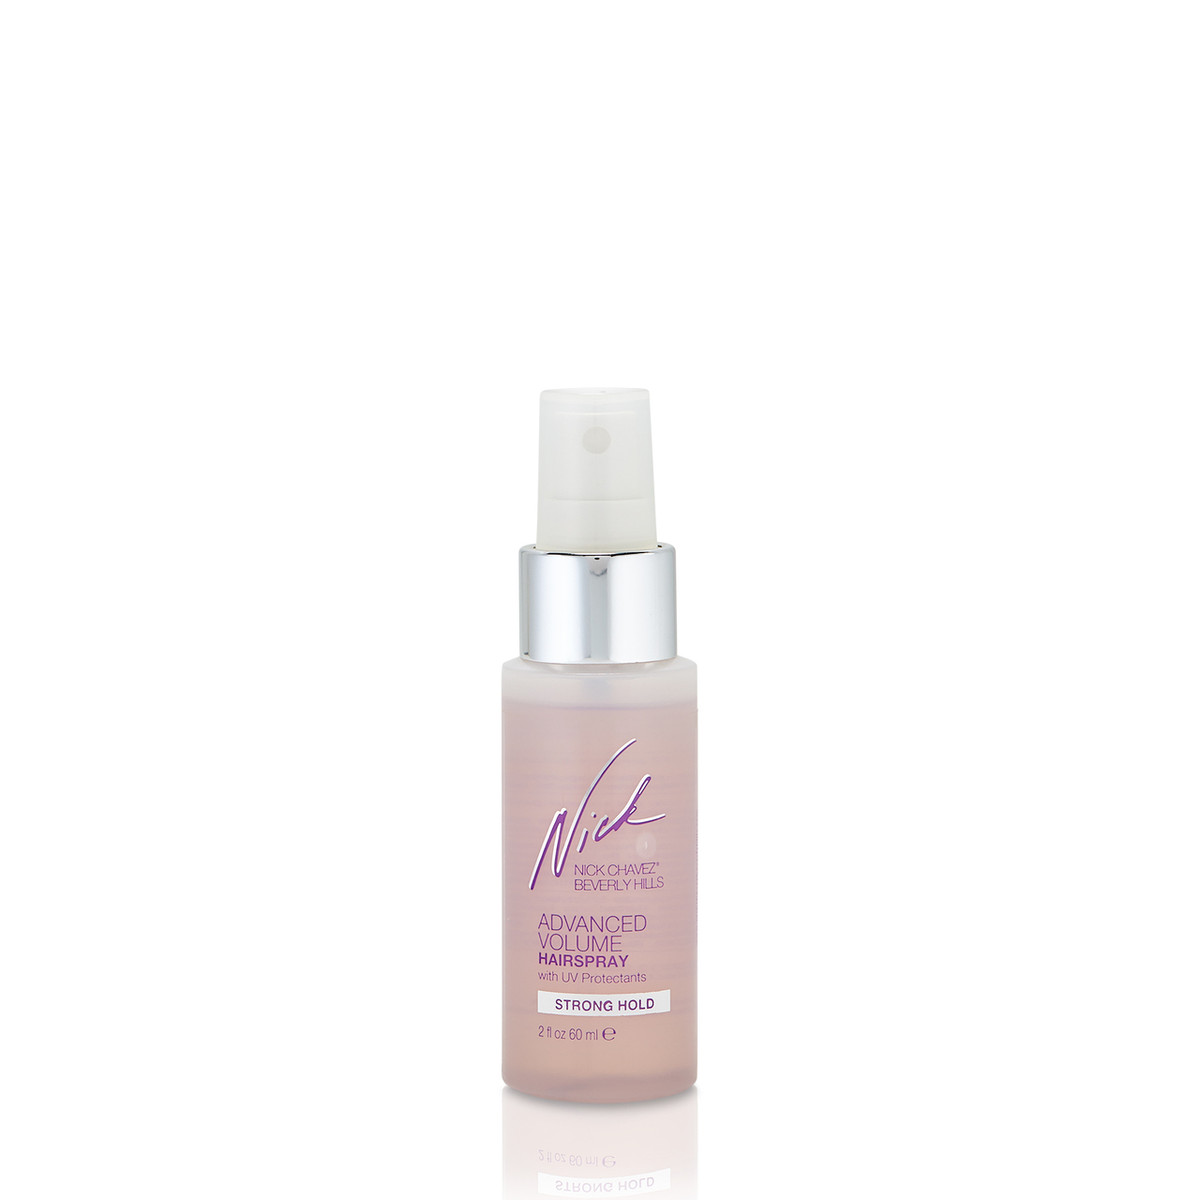 Advanced Volume Hairspray 2oz